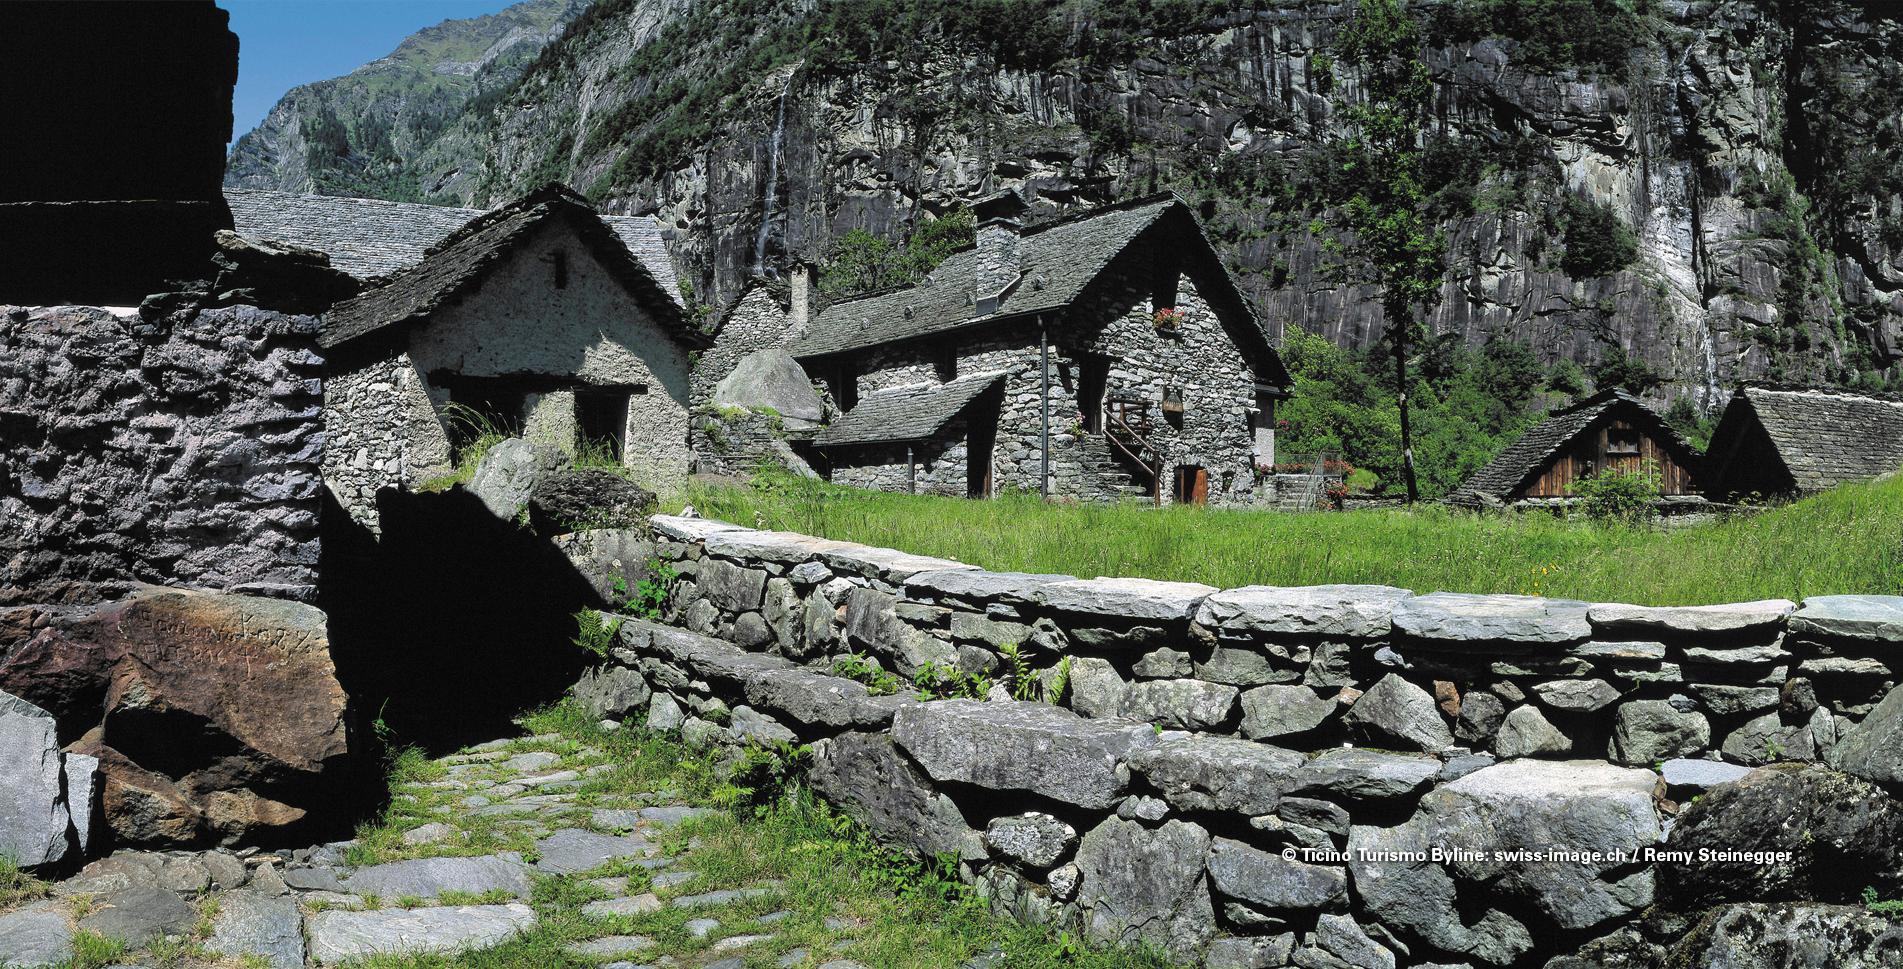 Wanderung im Tessin auf der Sentiero Cristallina im Val Bavona / Bavonatal von San Carlo via Sonlerto, Roseto, Foroglio, Sabbione, Fontana nach Bignasco